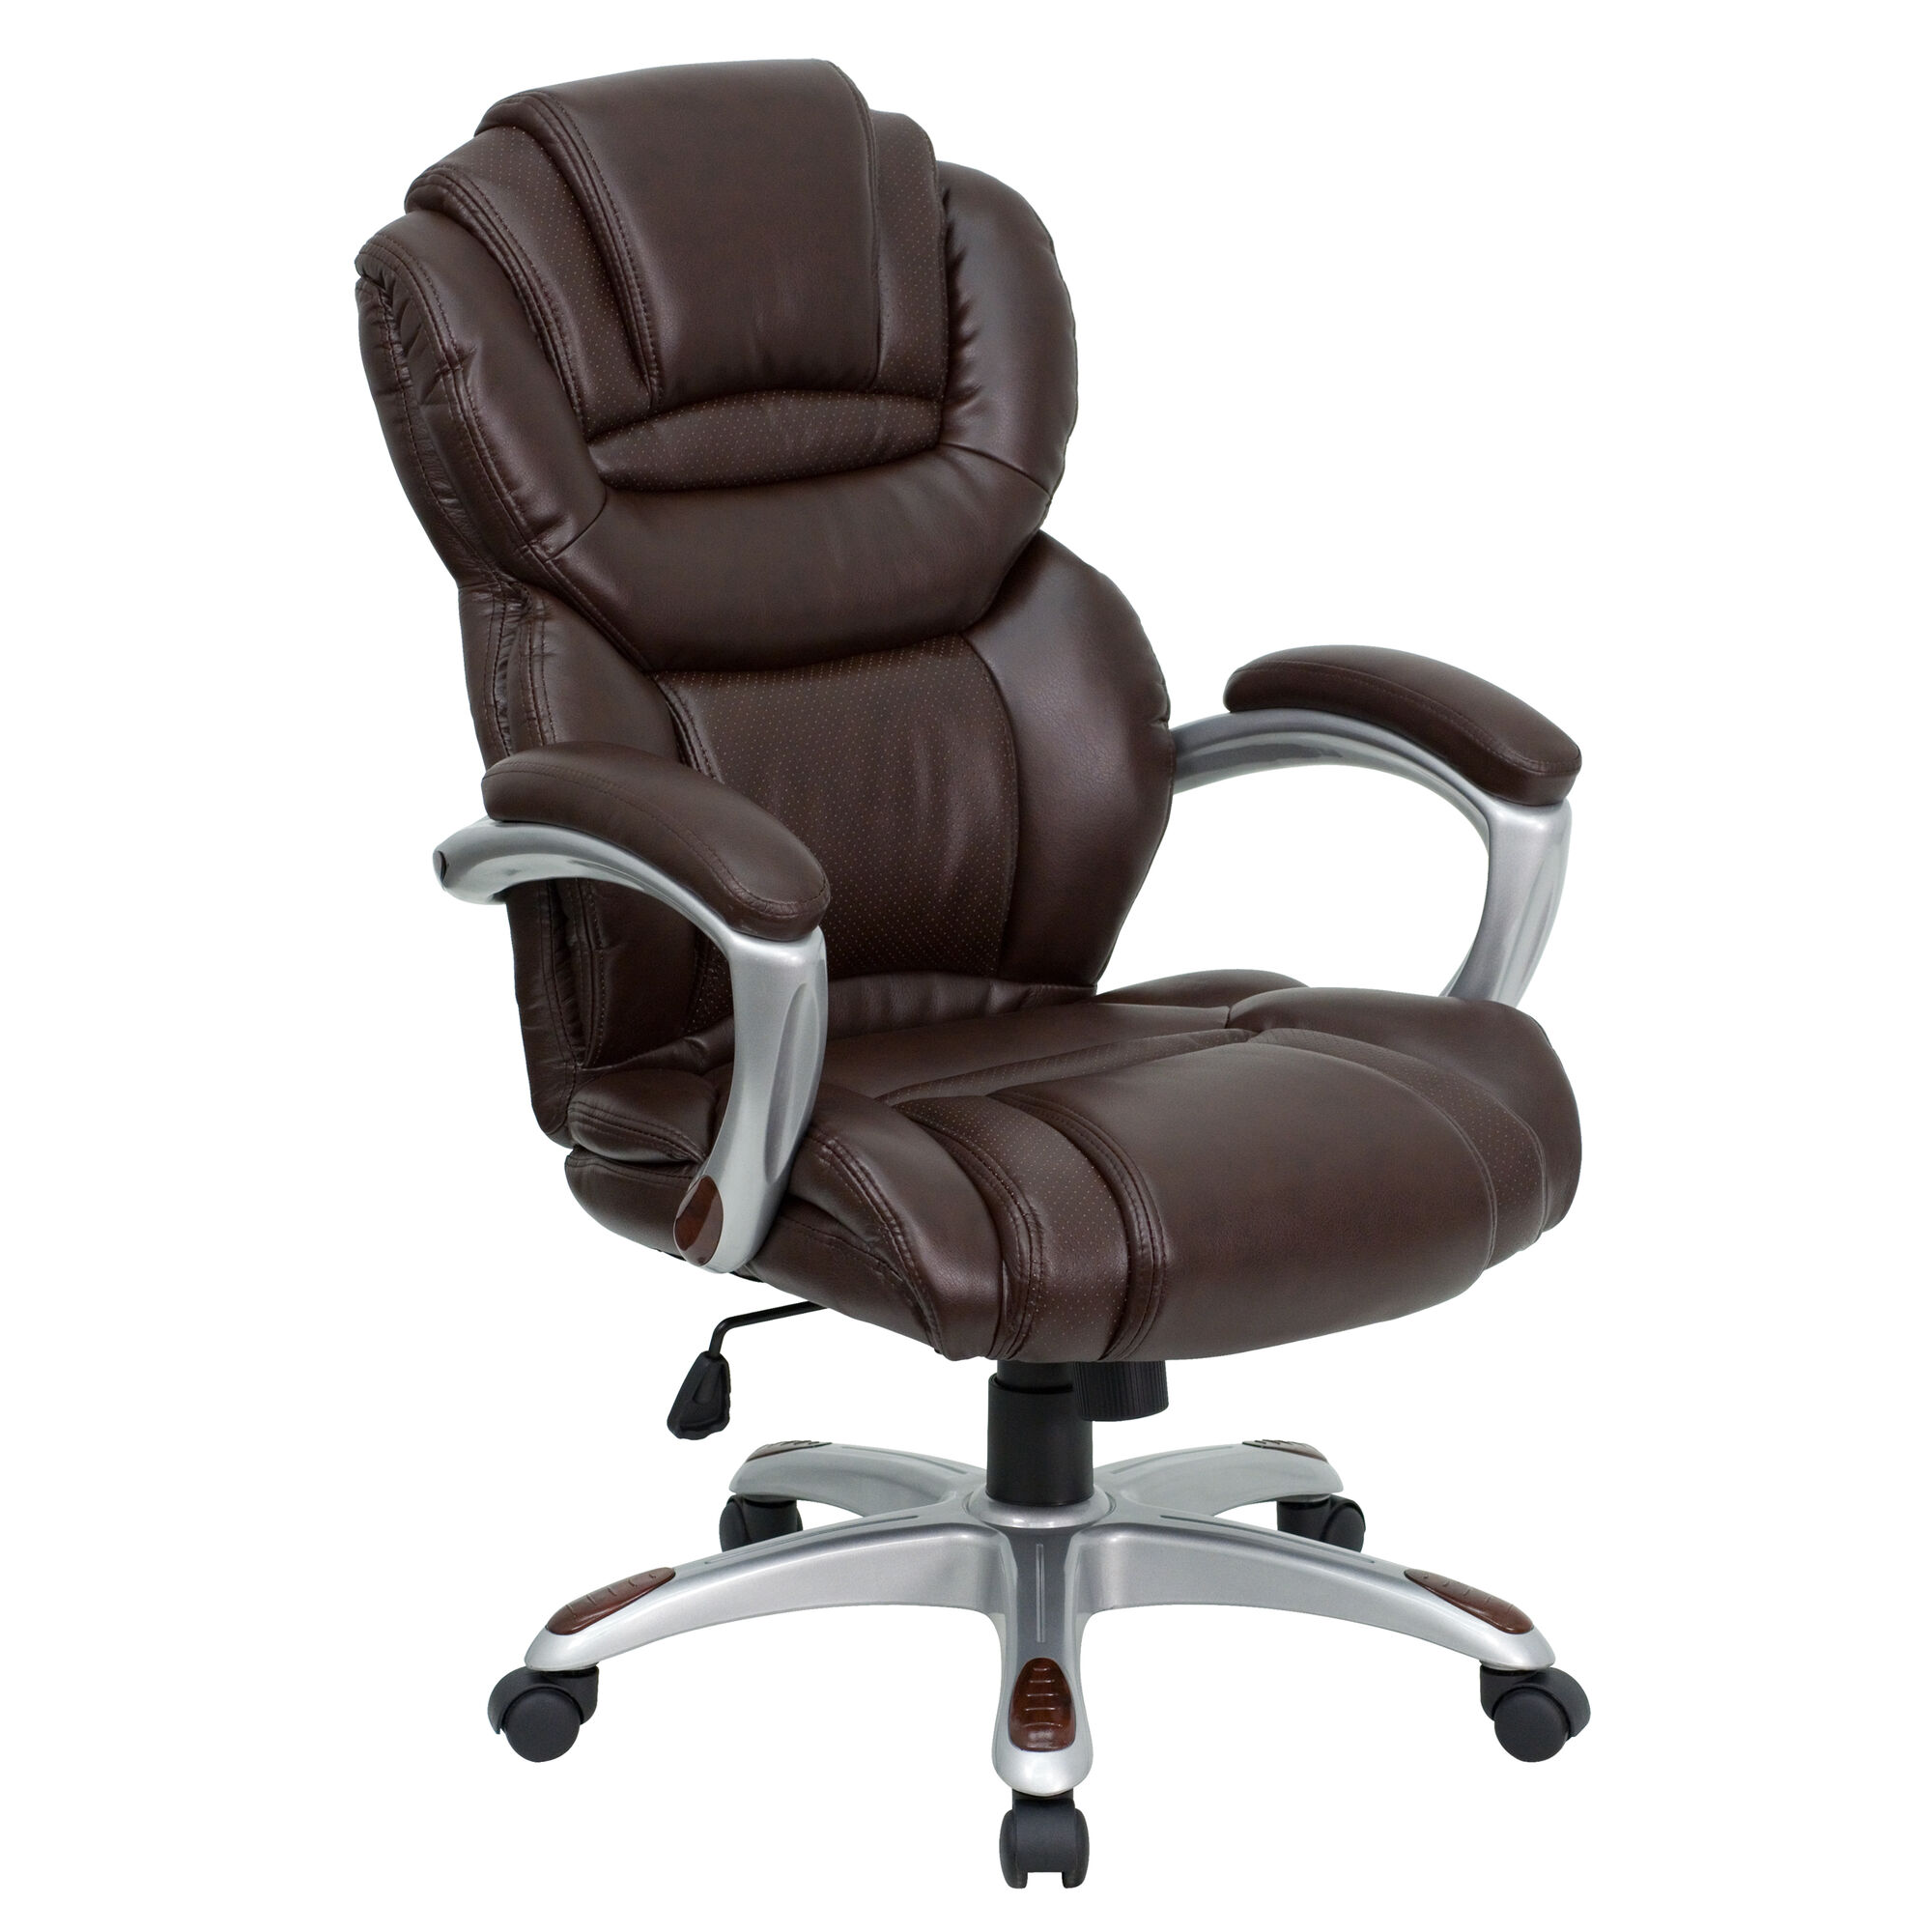 Flash Furniture GO 901 BN GG at Bizchair